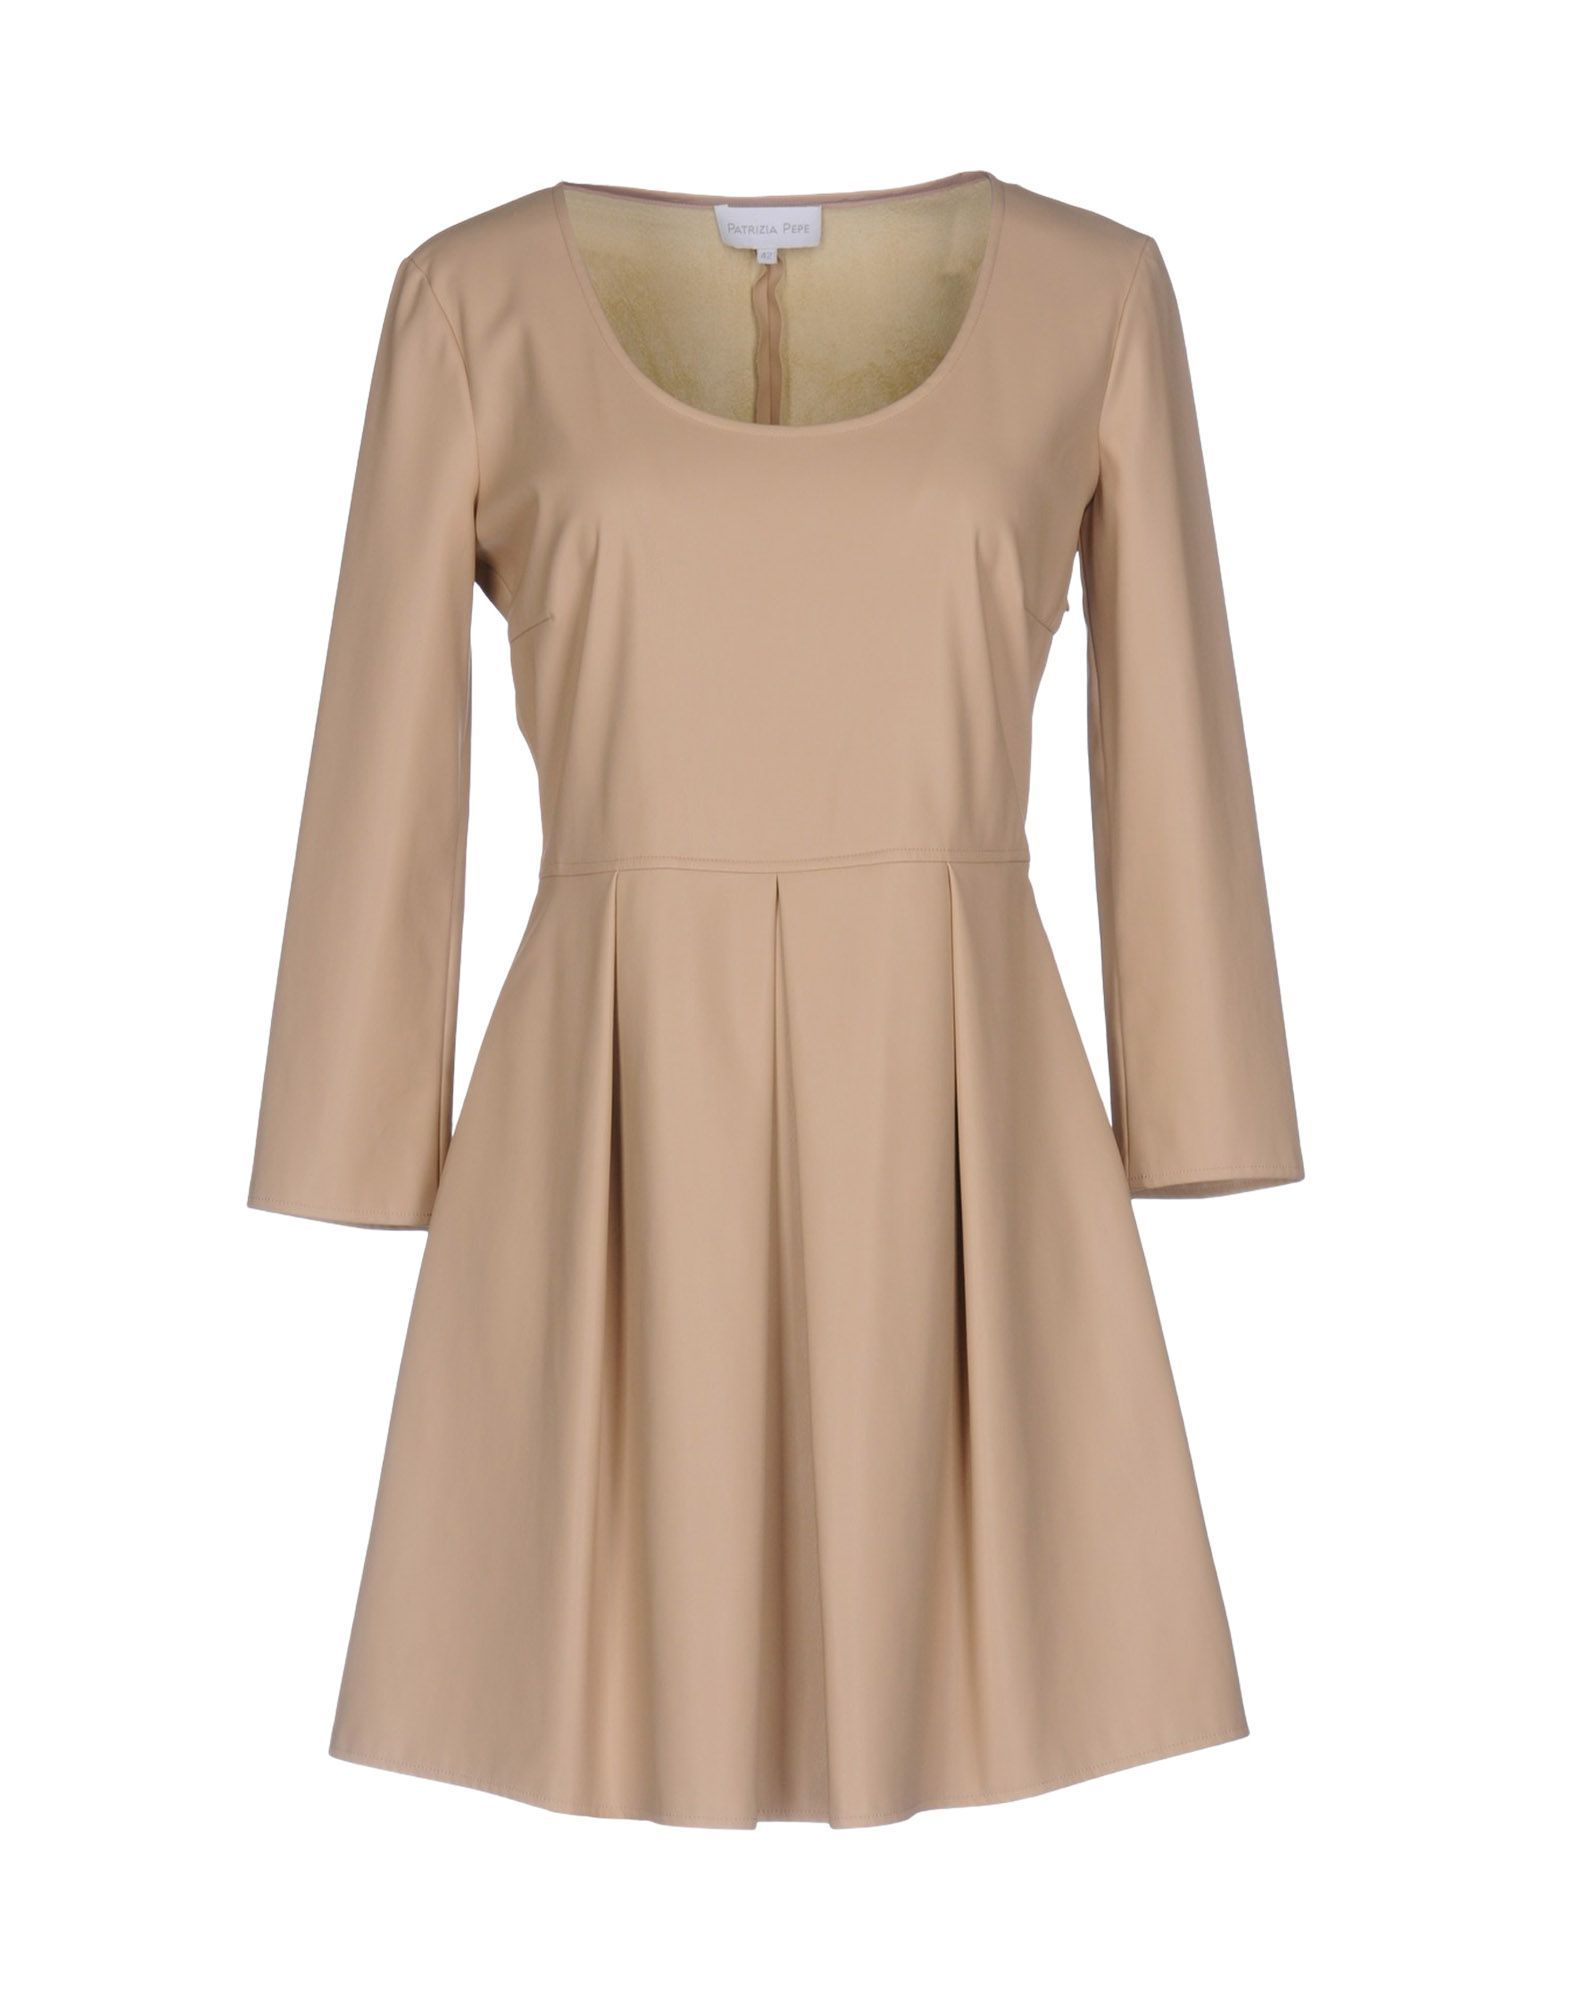 Patrizia Pepe Beige Faux Leather Dress